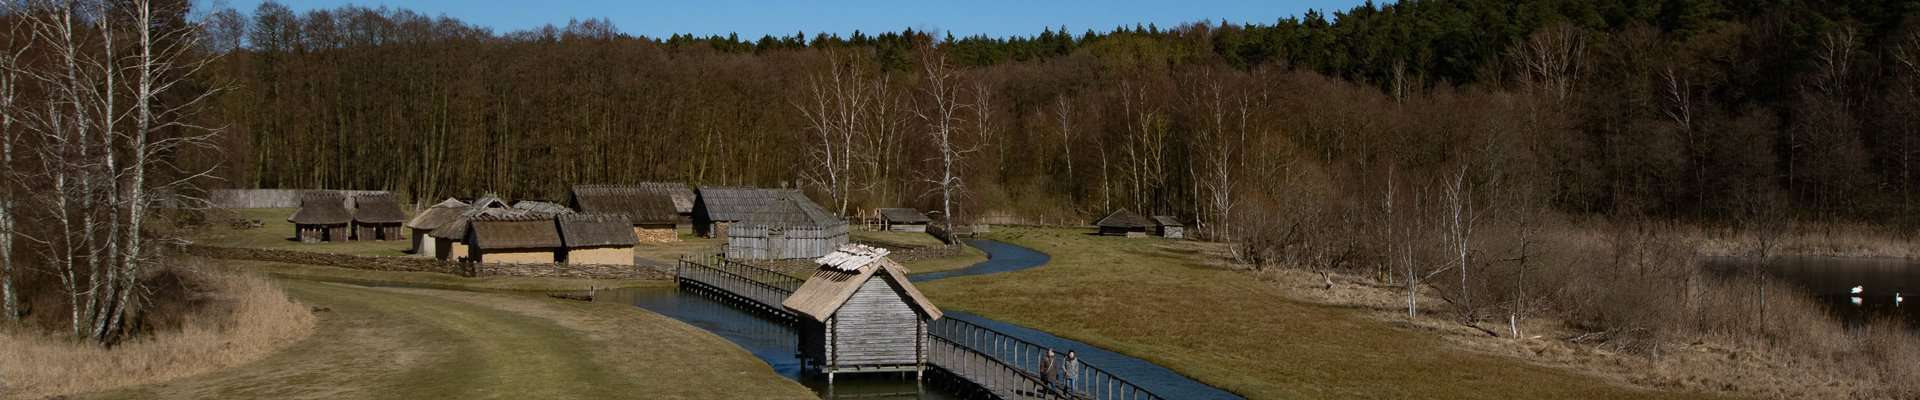 Archaeology Travel   Mecklenburg-Western Pomerania   1